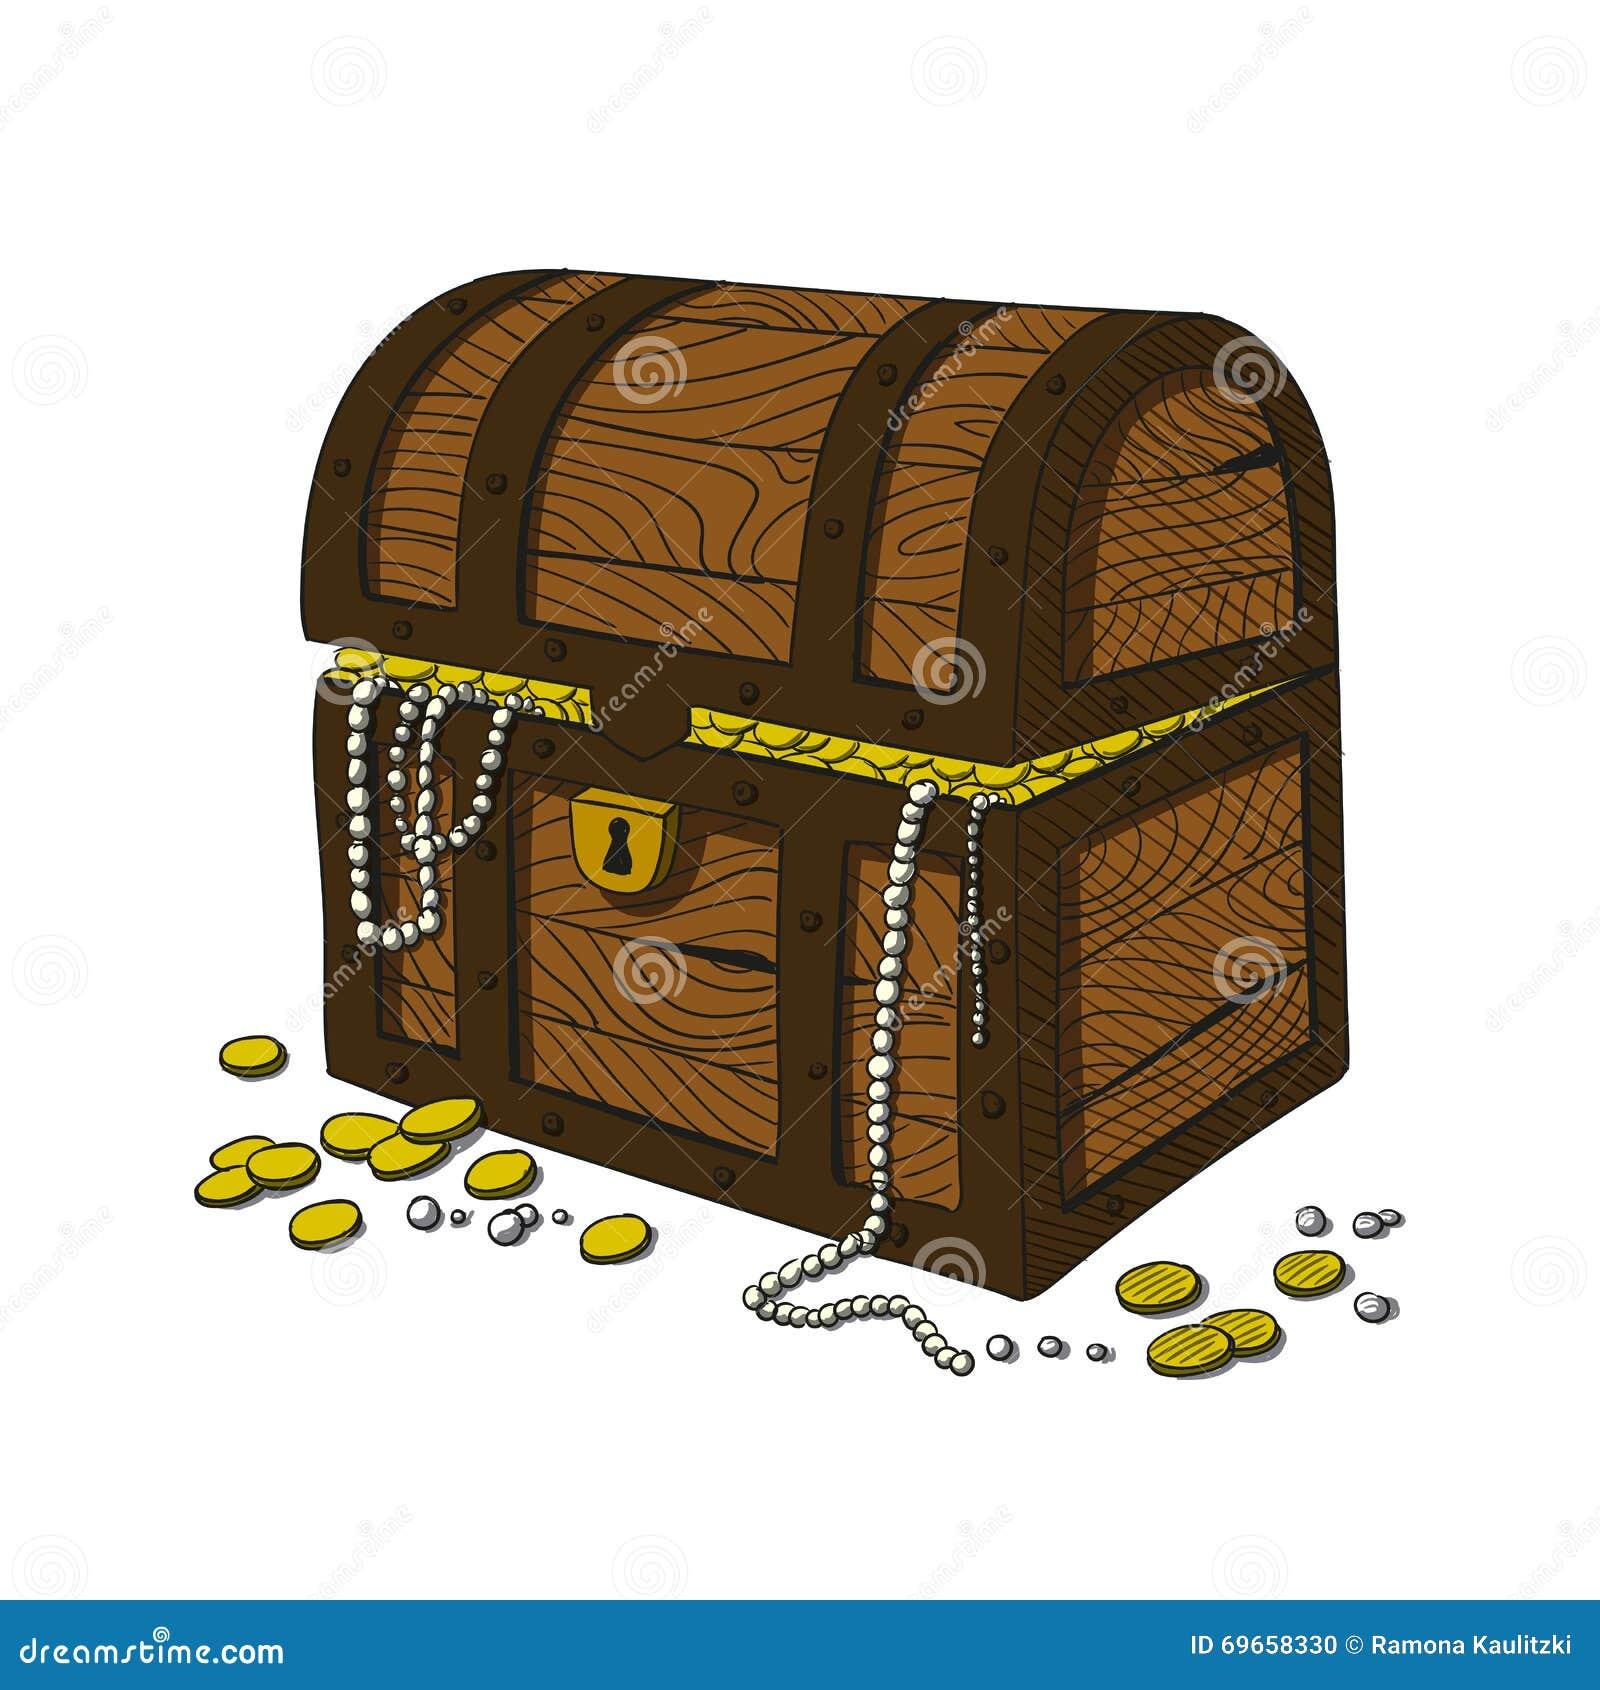 hand-drawn-treasure-chest-illustration-69658330.jpg